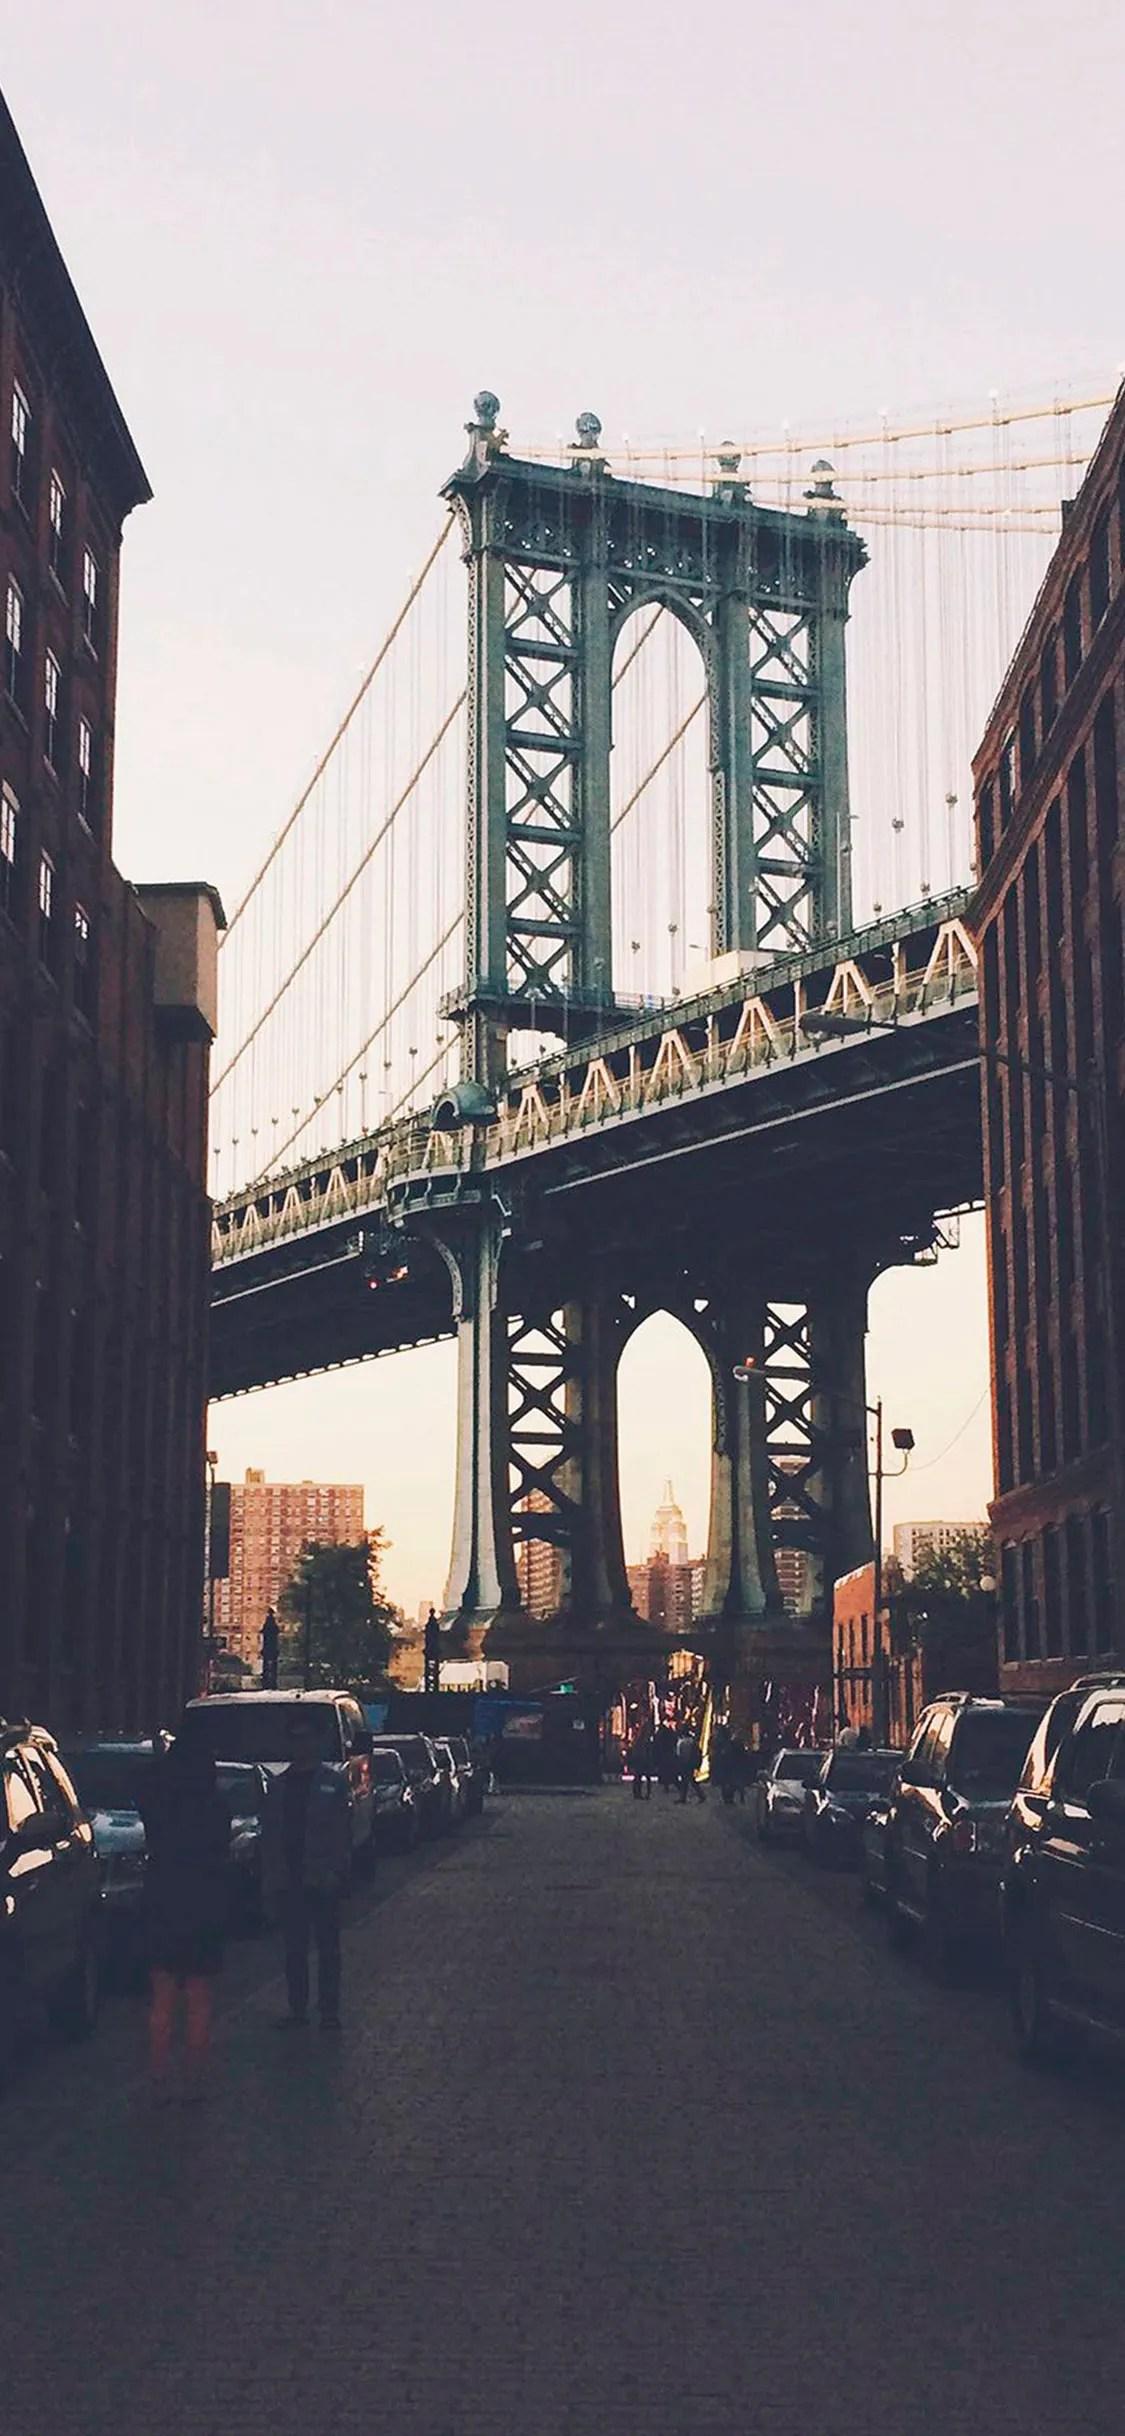 iPhone wallpaper new york bridge New York